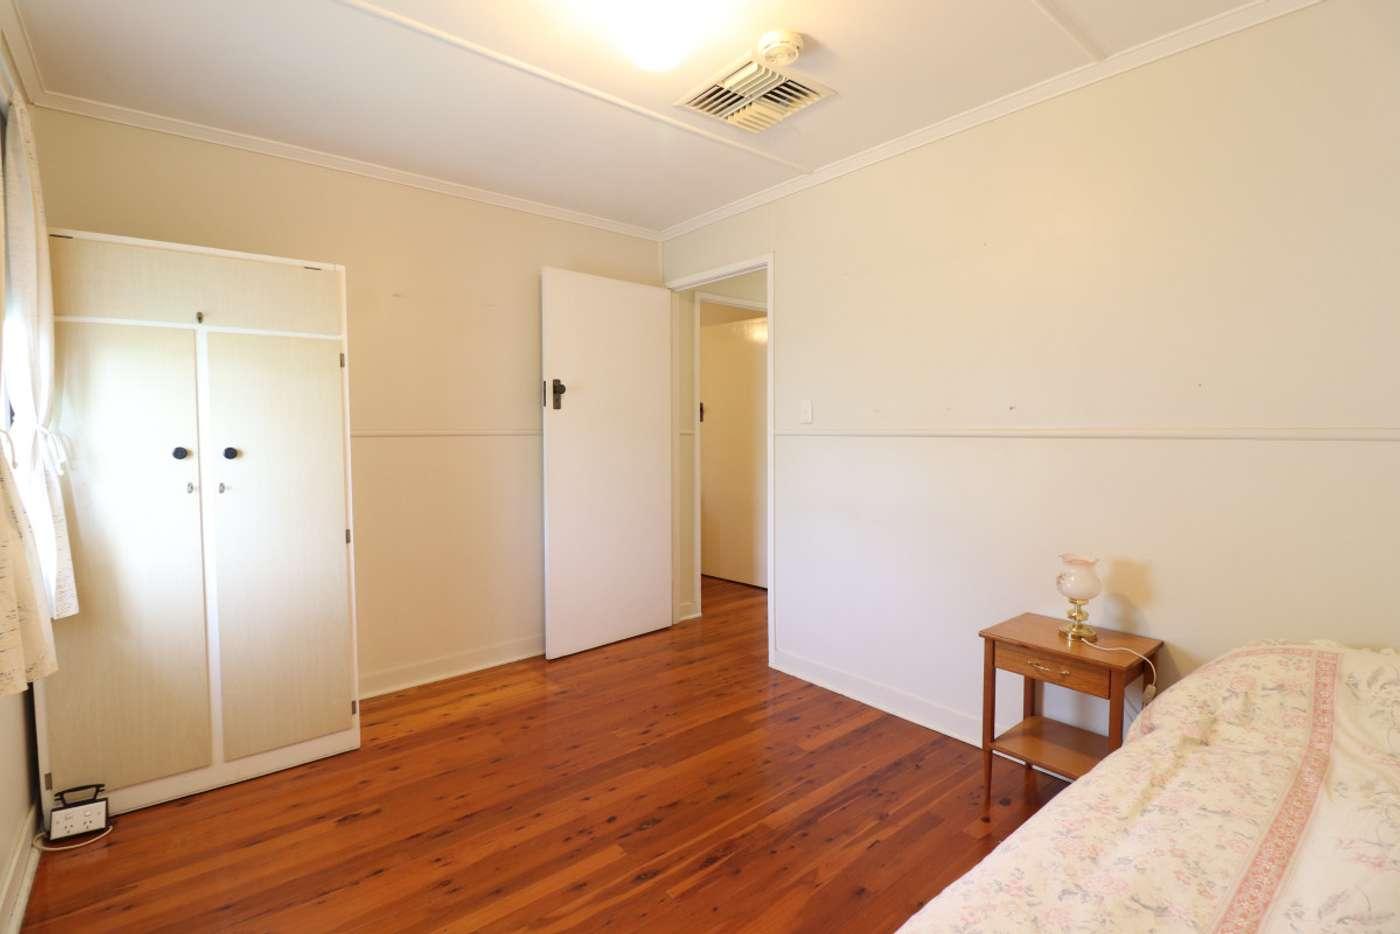 Sixth view of Homely house listing, 4 Sandhurst Street, Goondiwindi QLD 4390